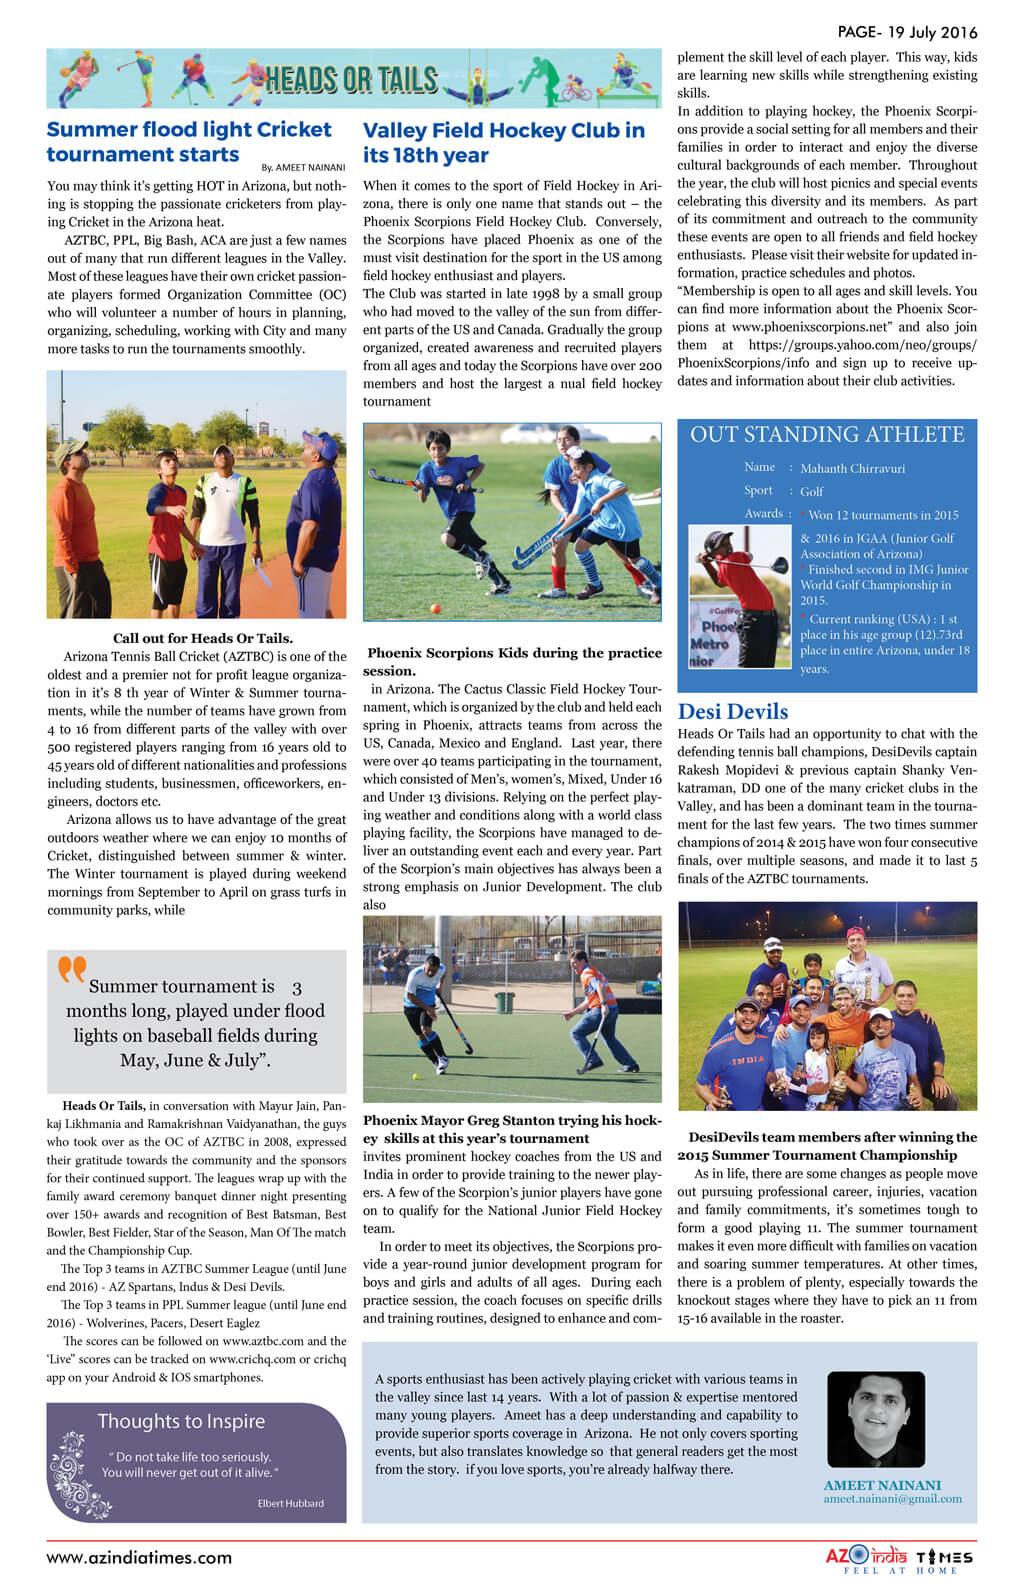 AZ INDIA NEWS PAGE-19